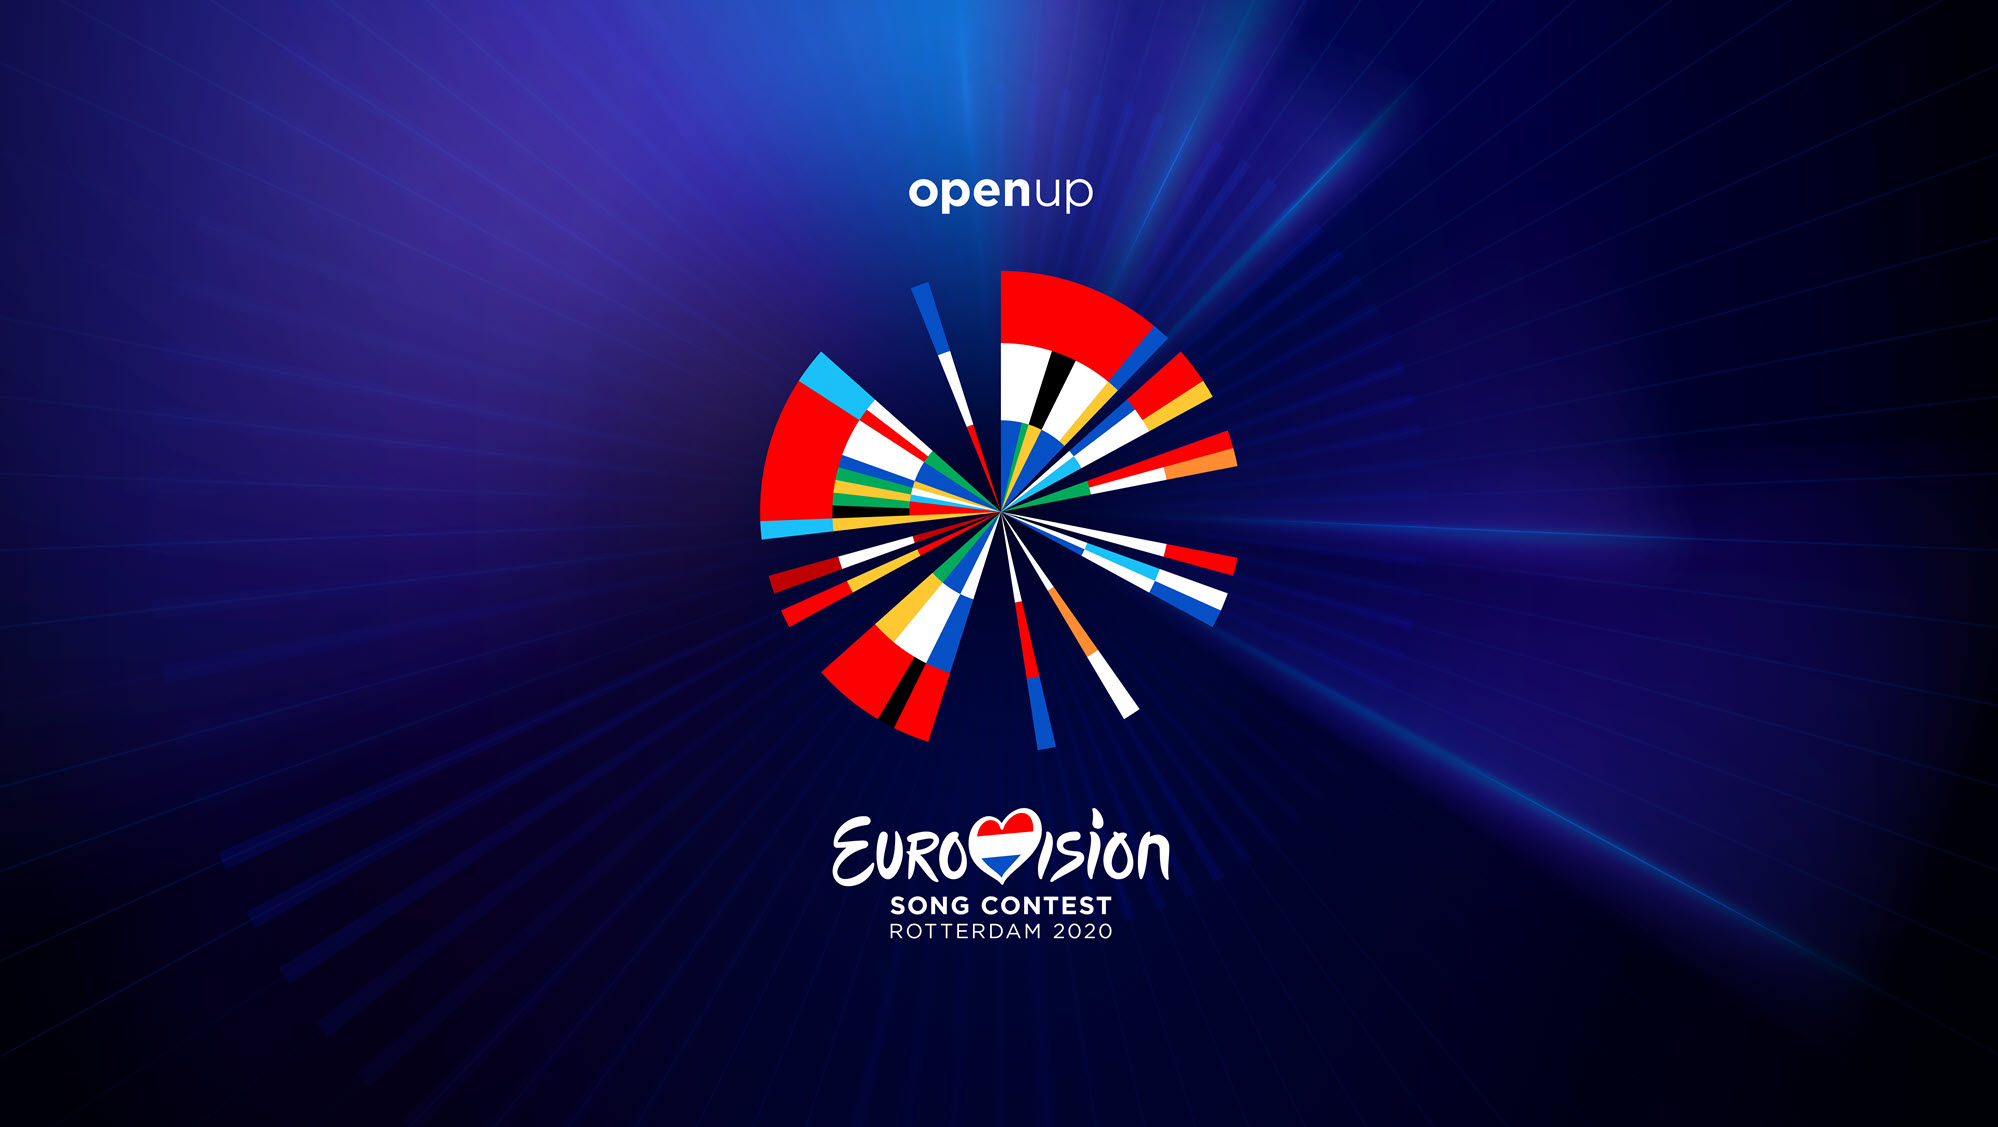 Songfestival logo